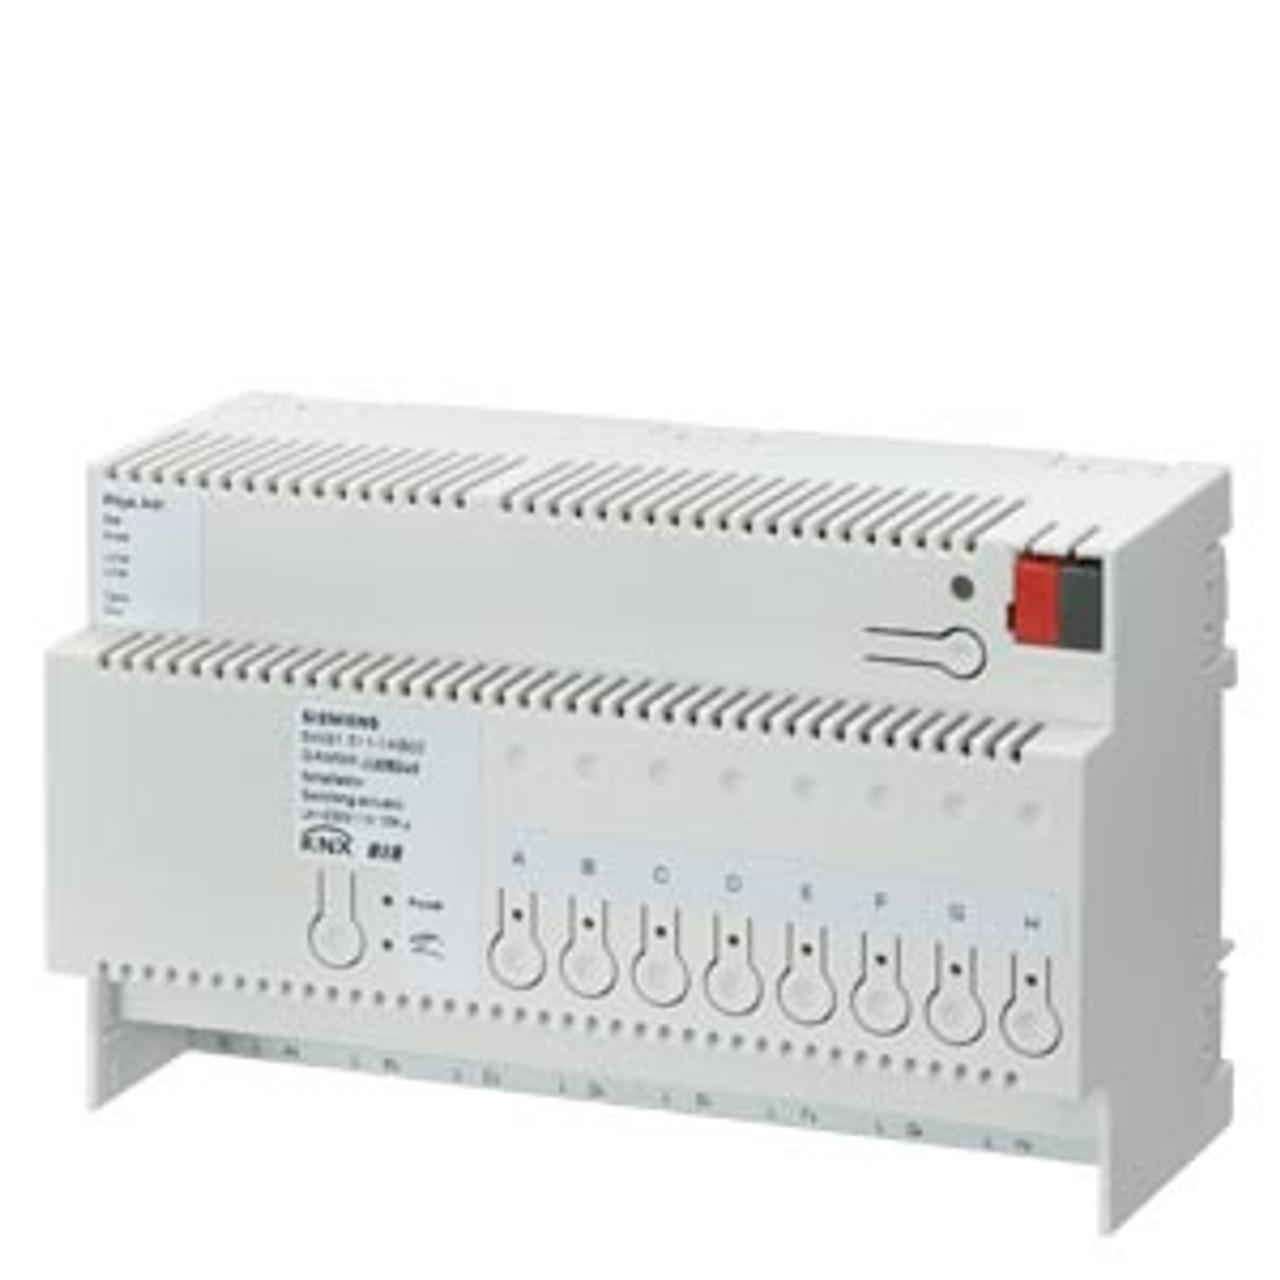 Siemens 5WG1511-1AB02